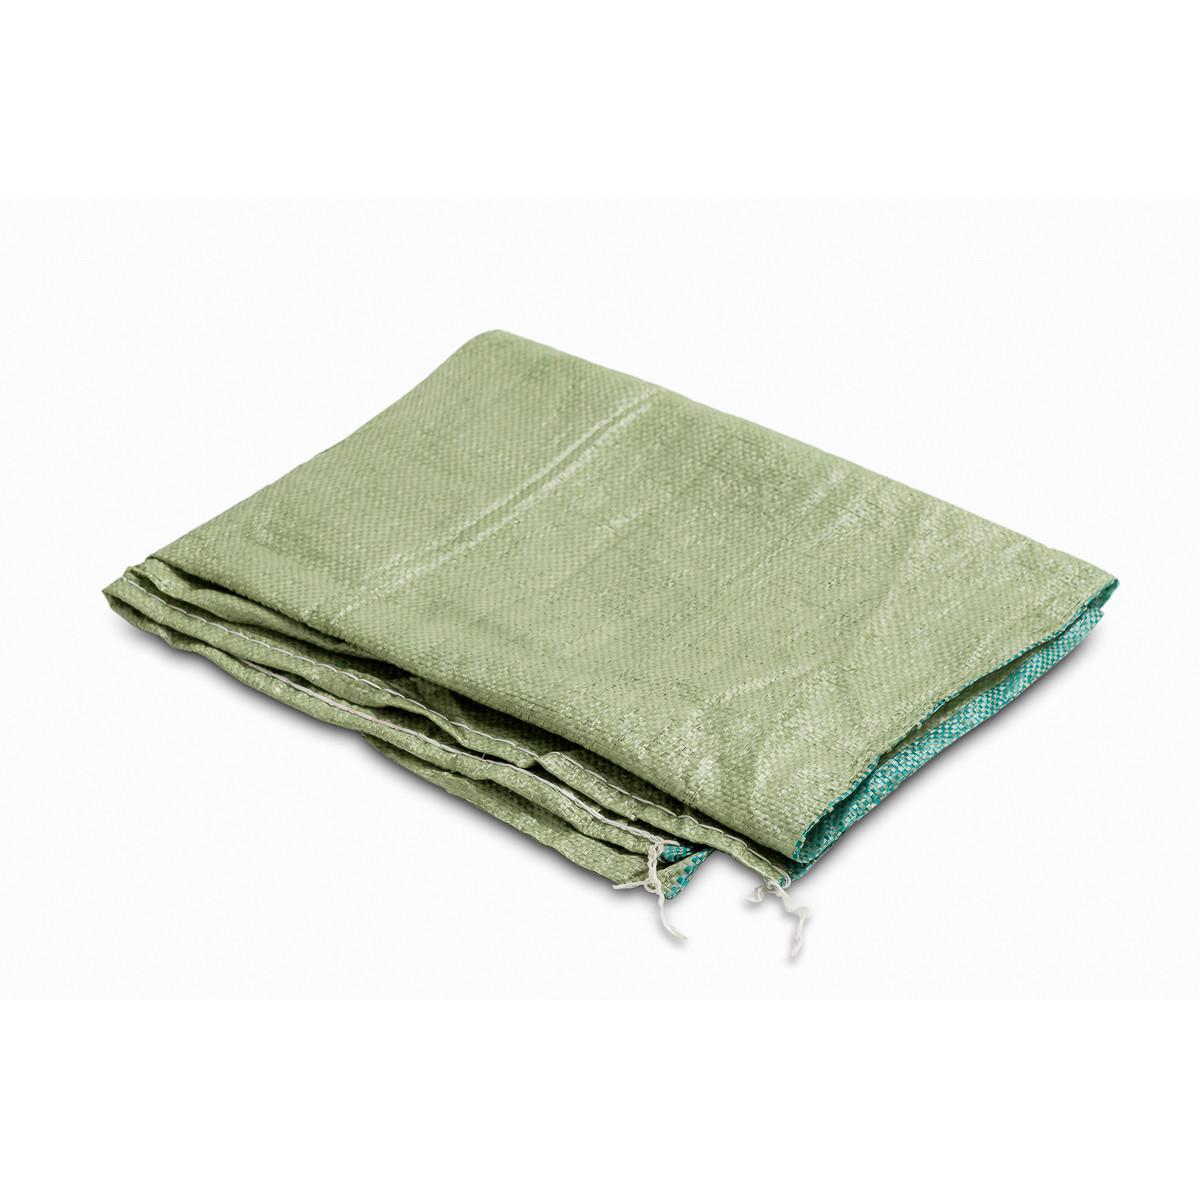 Мешок для мусора 90x130 мм ткань/пропилен зеленый